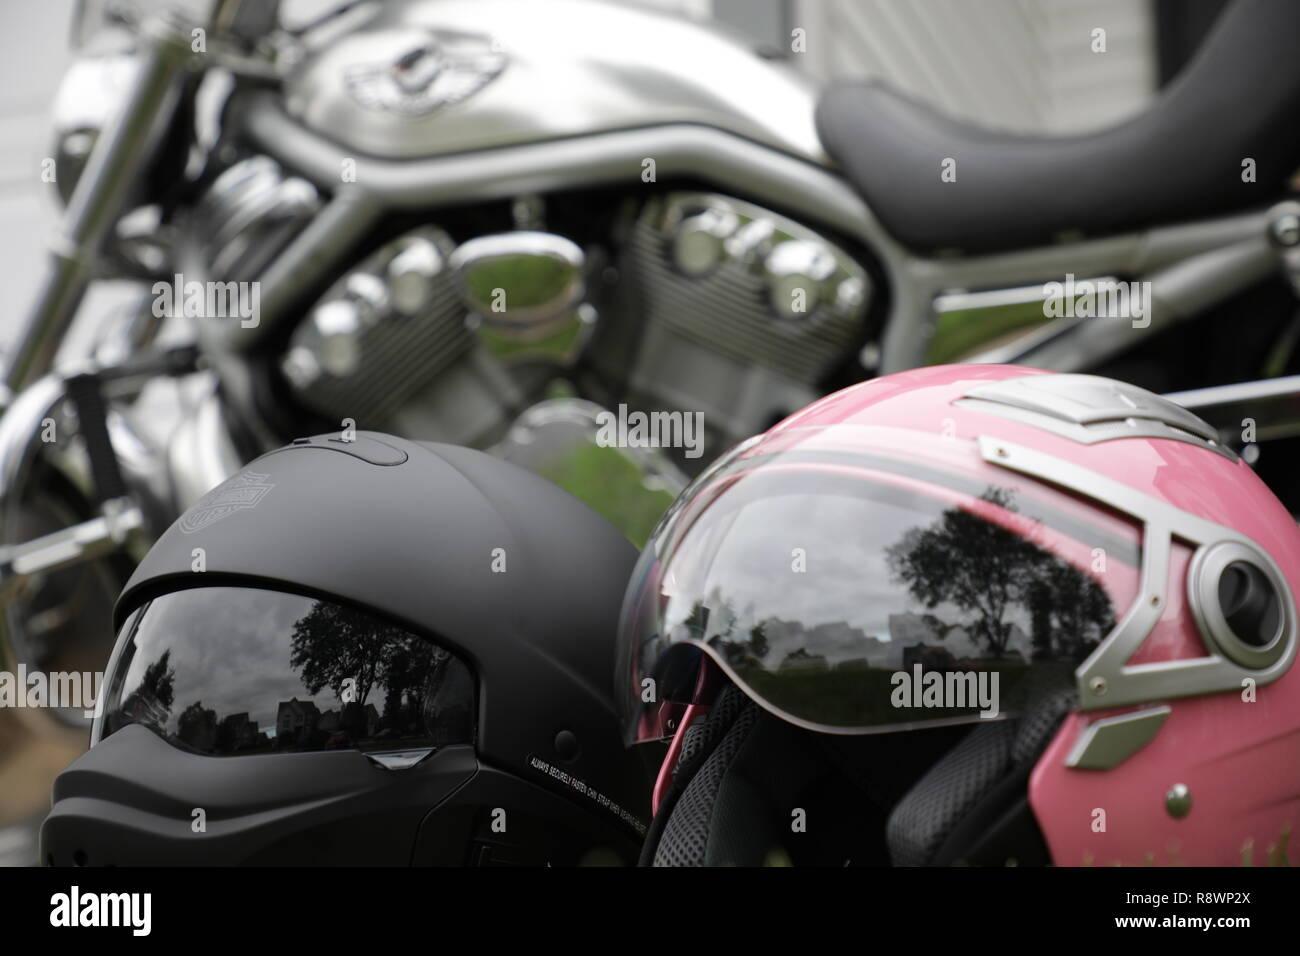 V-Rod Motorcycle 100 year Anniversary - Stock Image